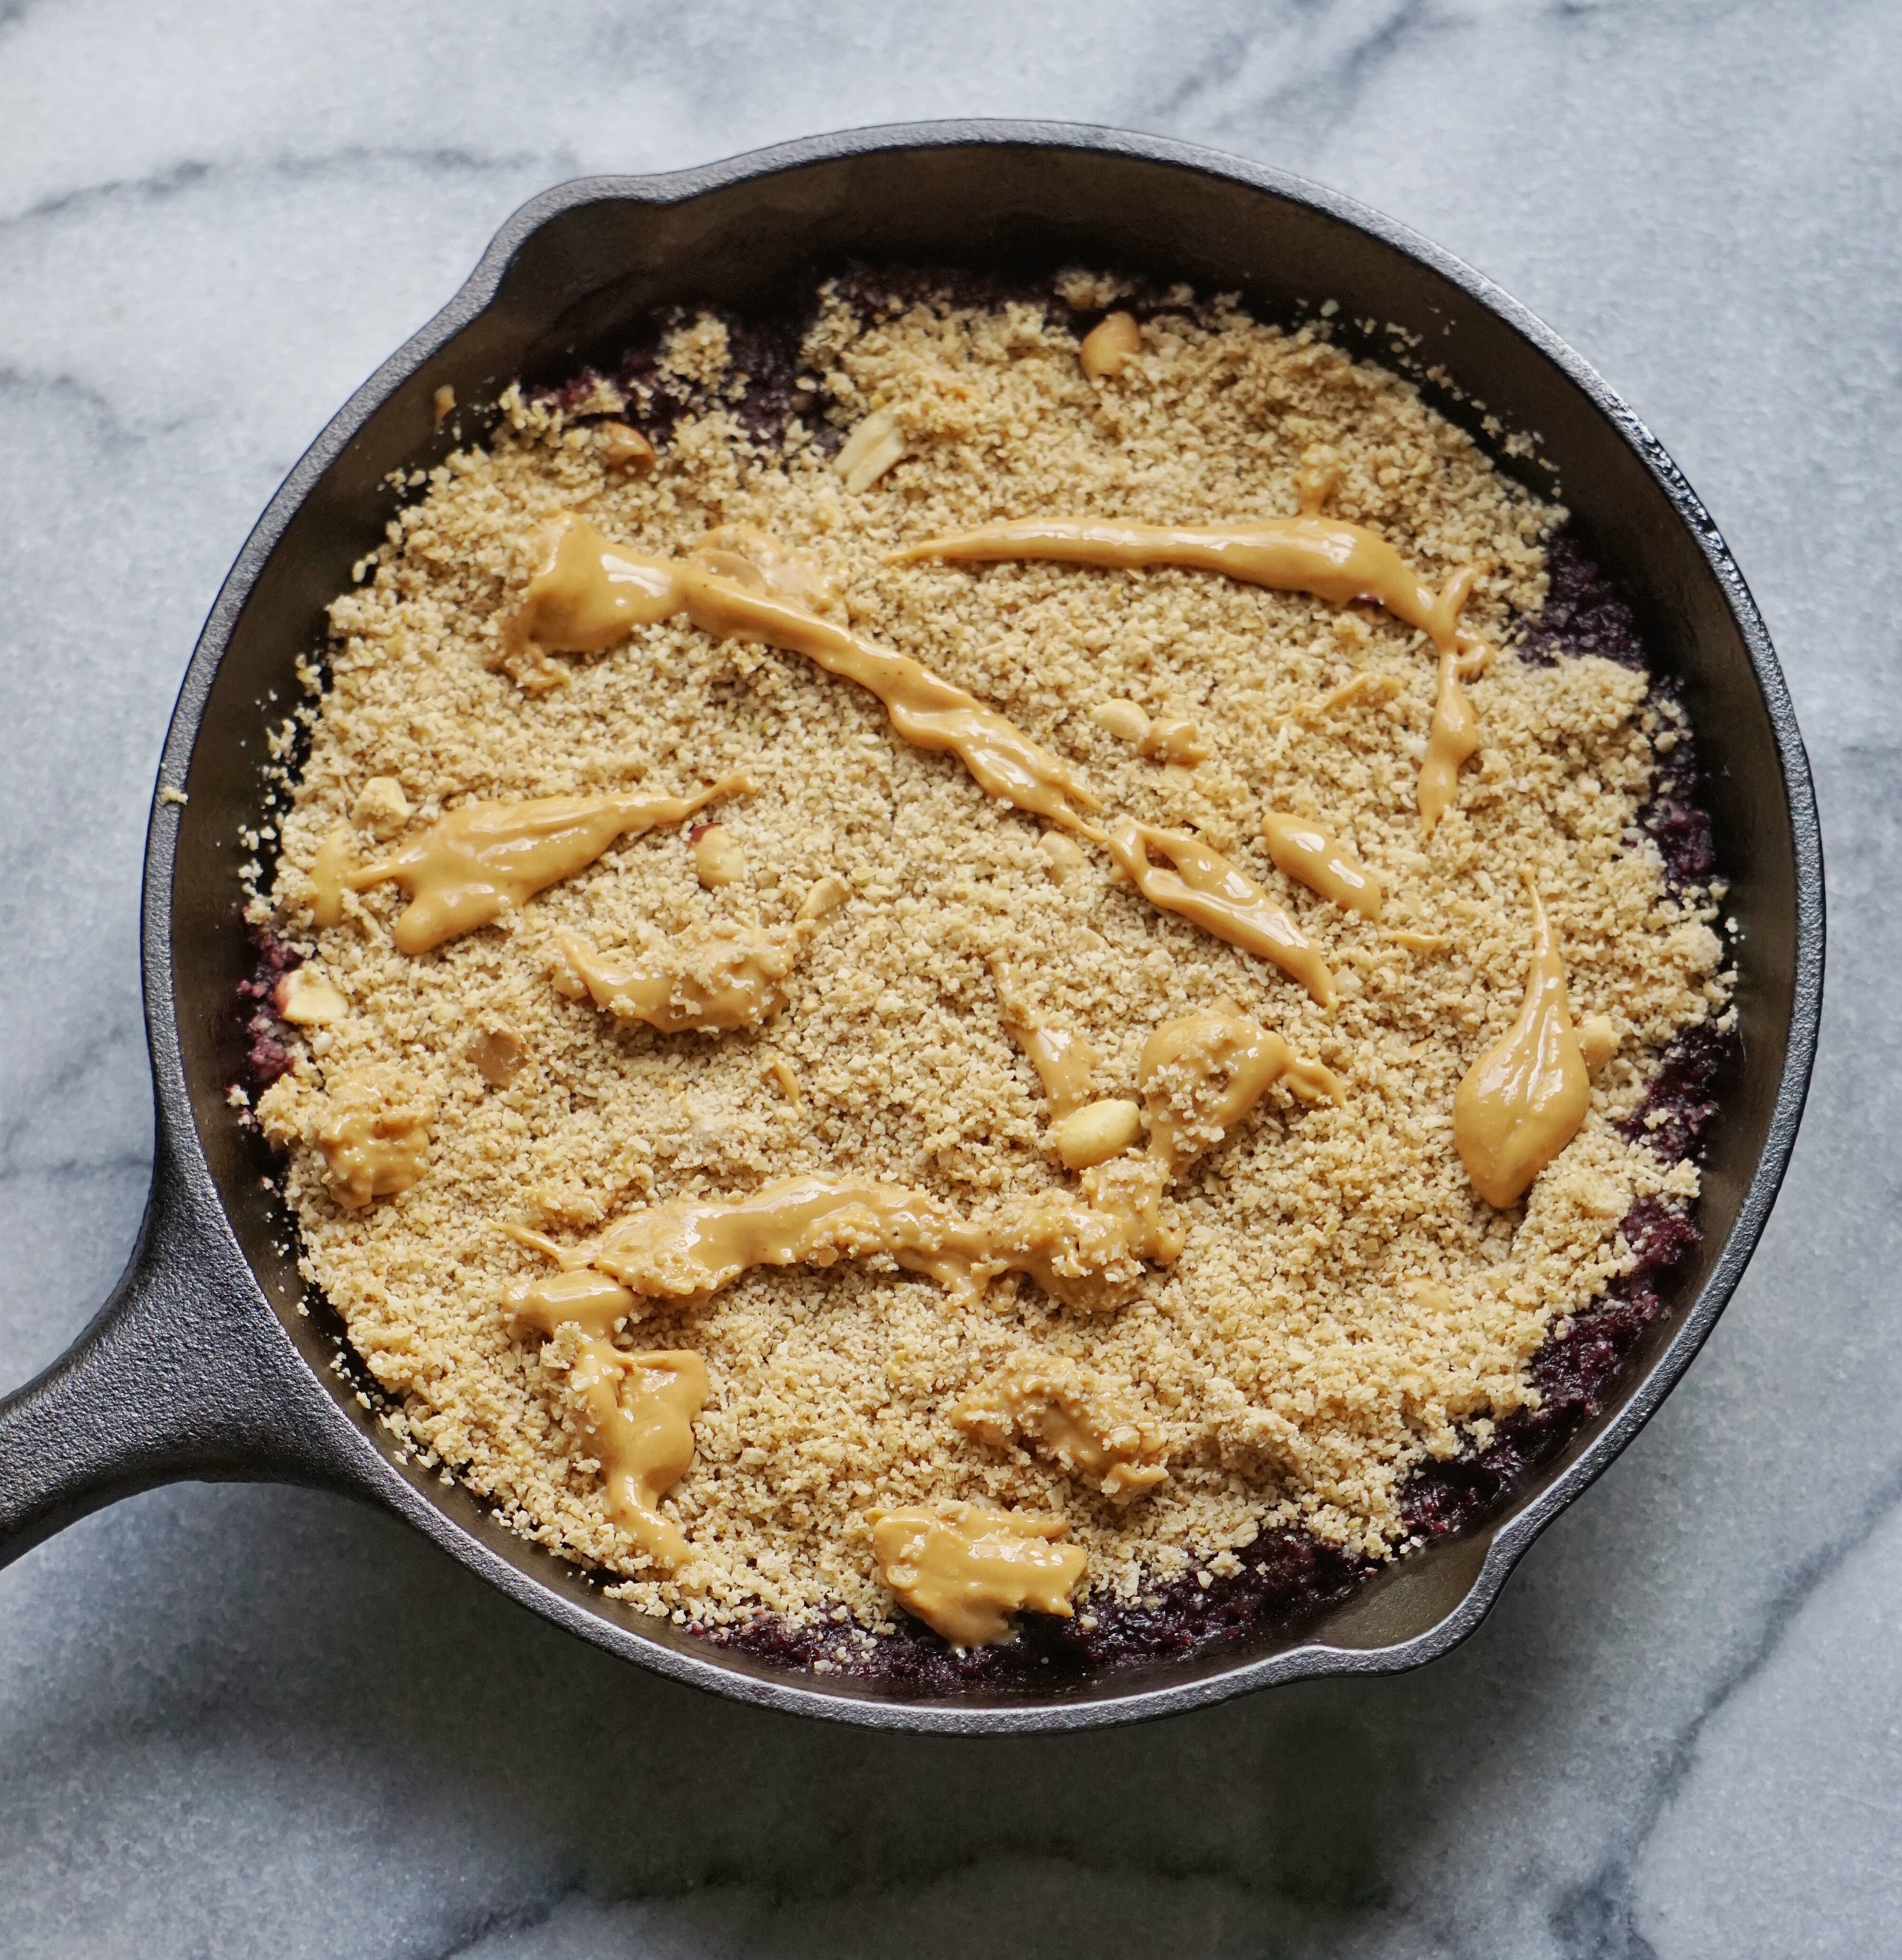 PBJ Crumble Leahs Plate. - Peanut Butter & Jelly Crumble